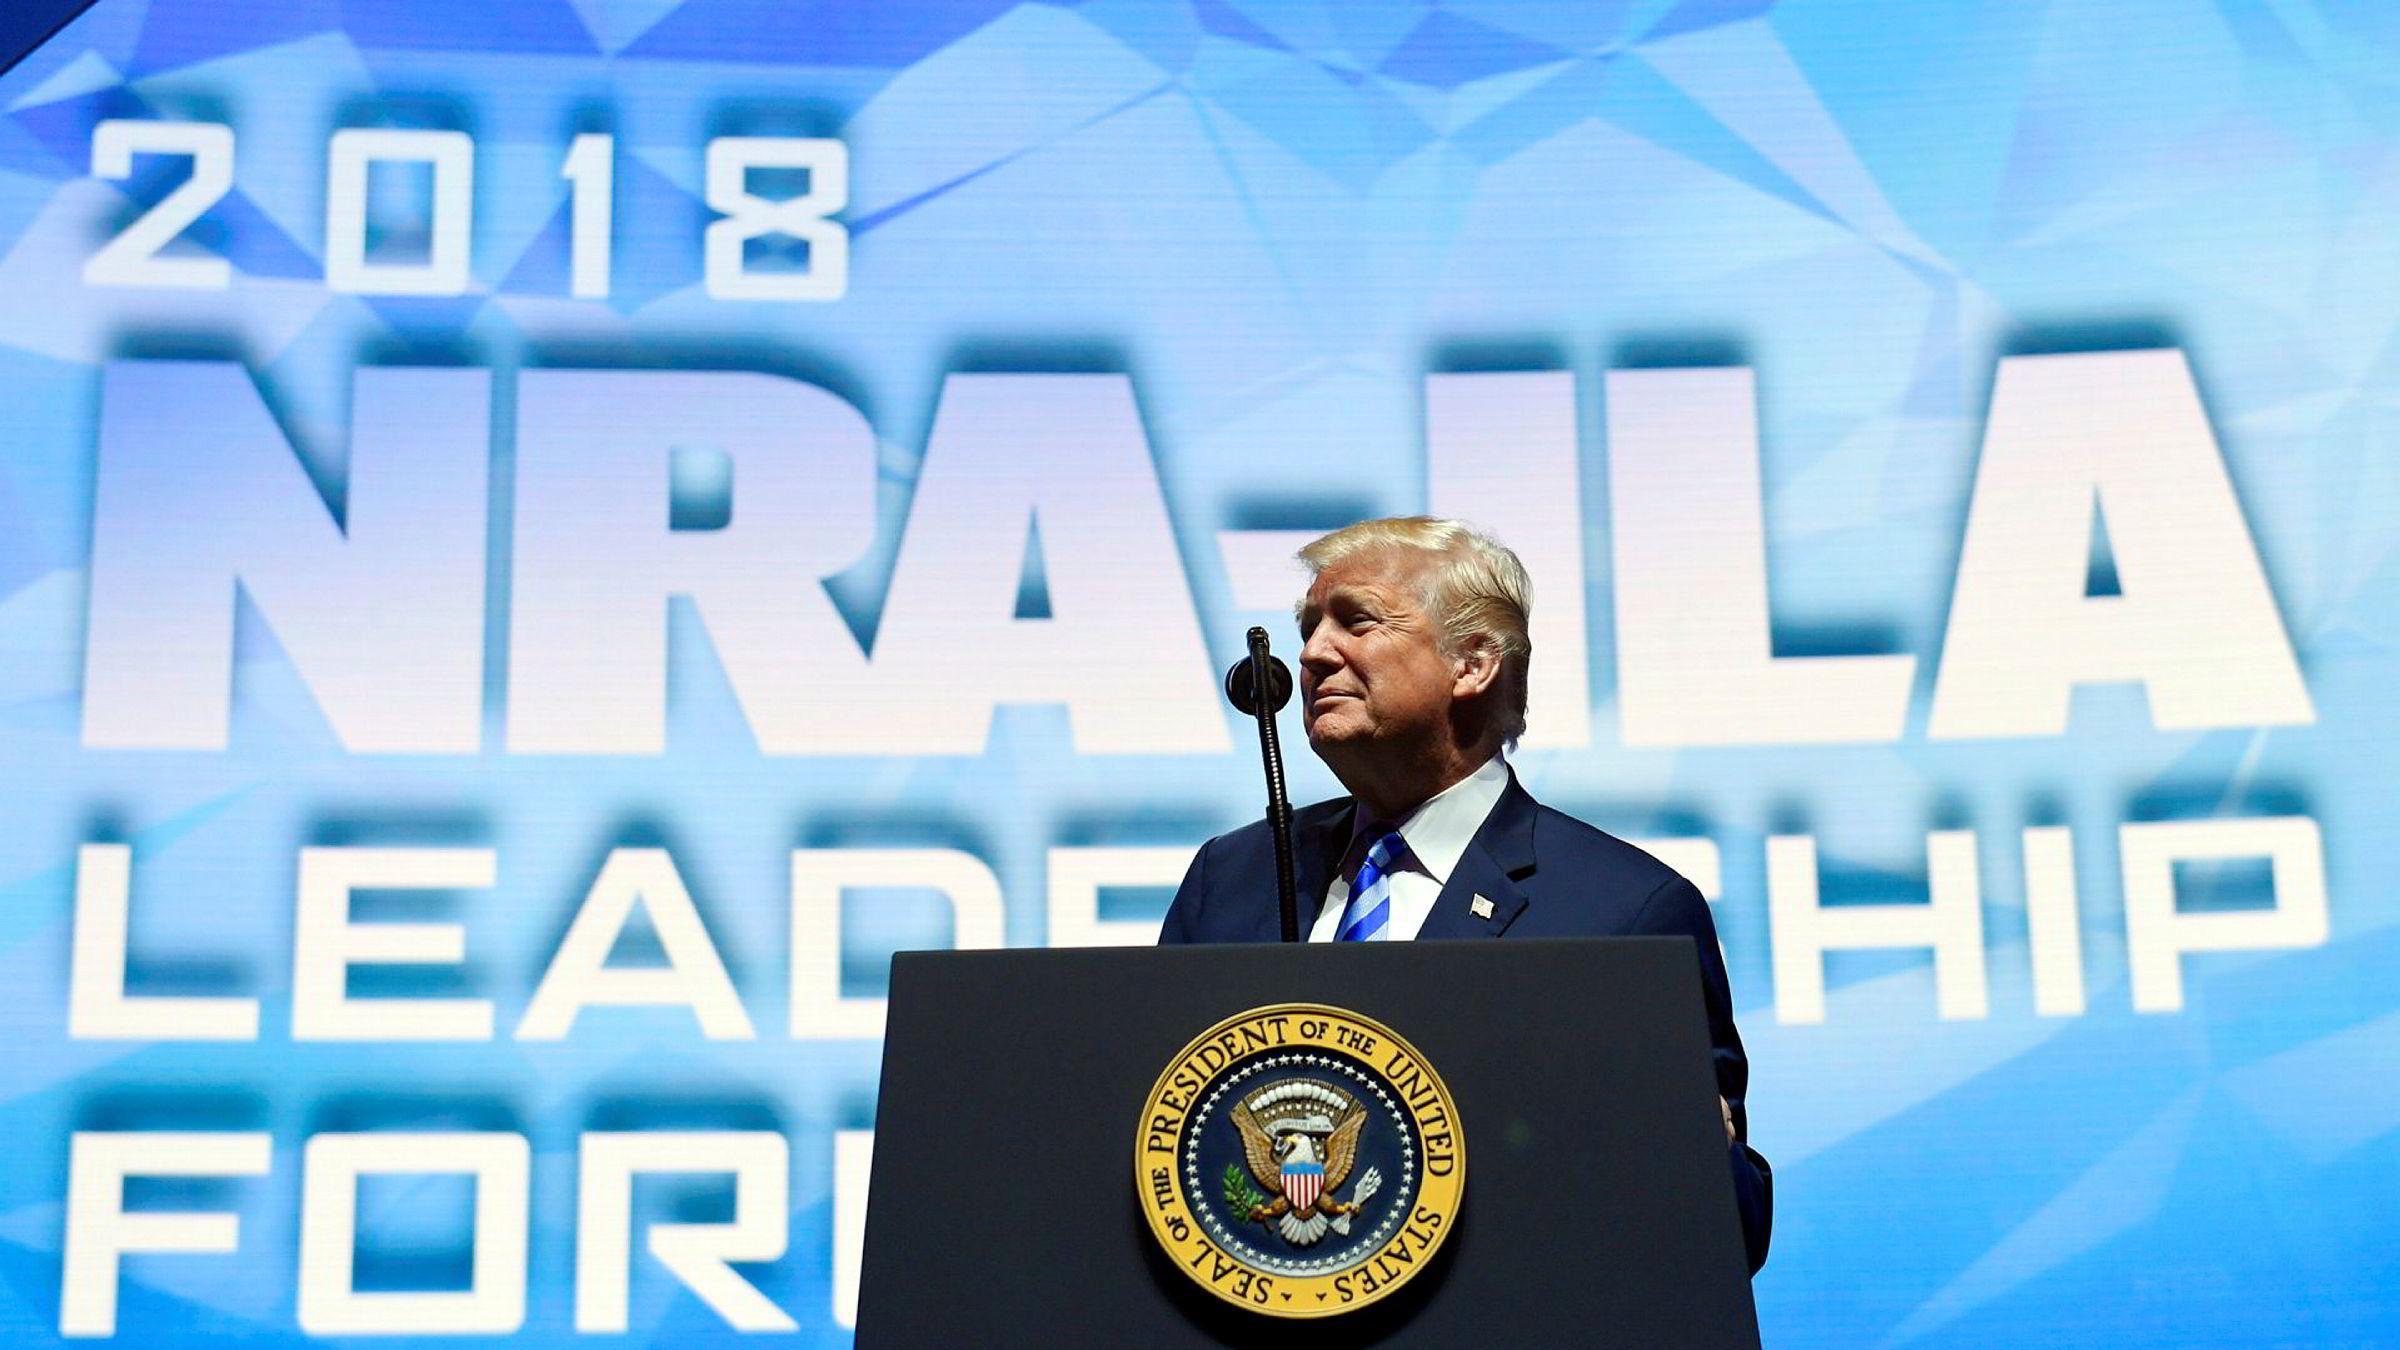 President Donald Trump talte på årsmøte til National Rifle Association (NRA) i Dallas fredag.